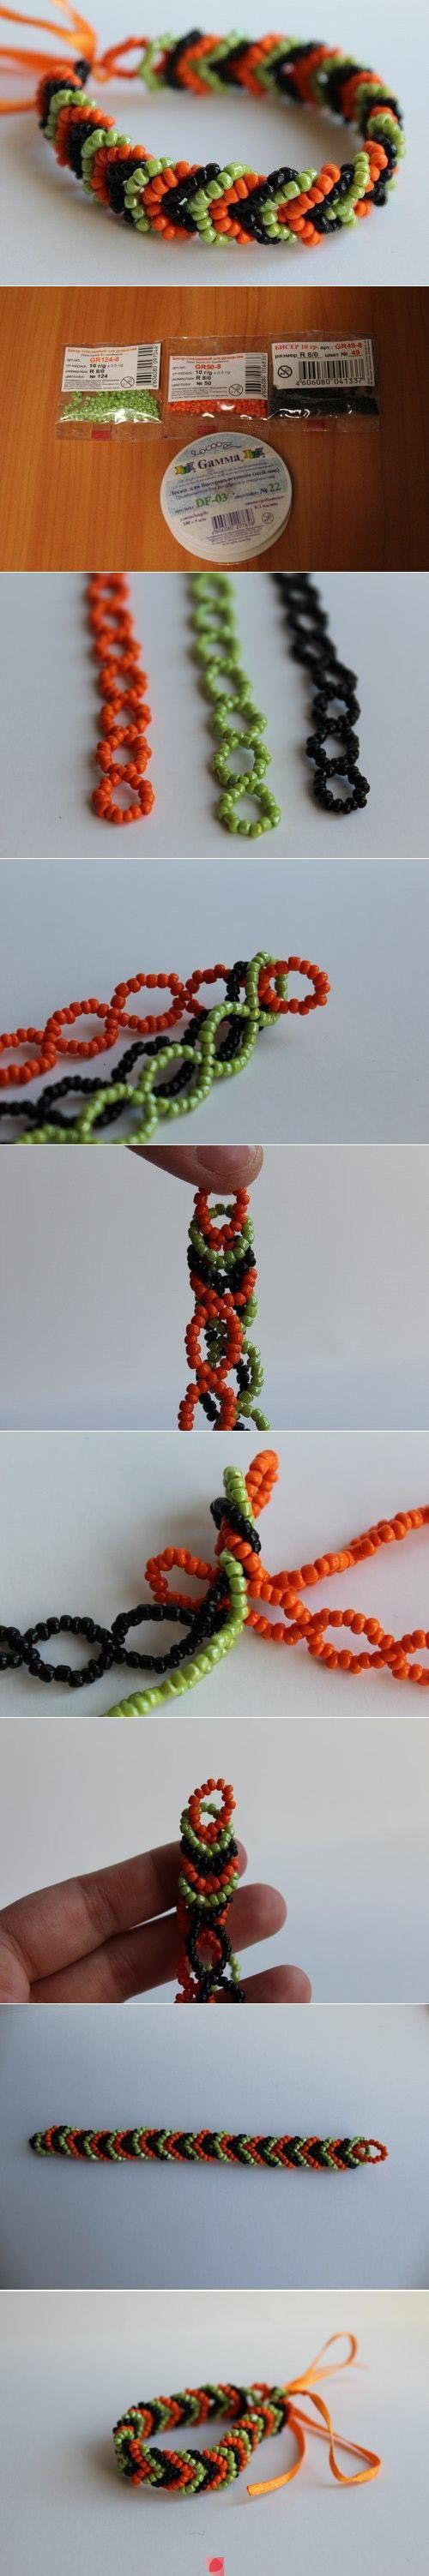 ..layered seed bead rope bracelet